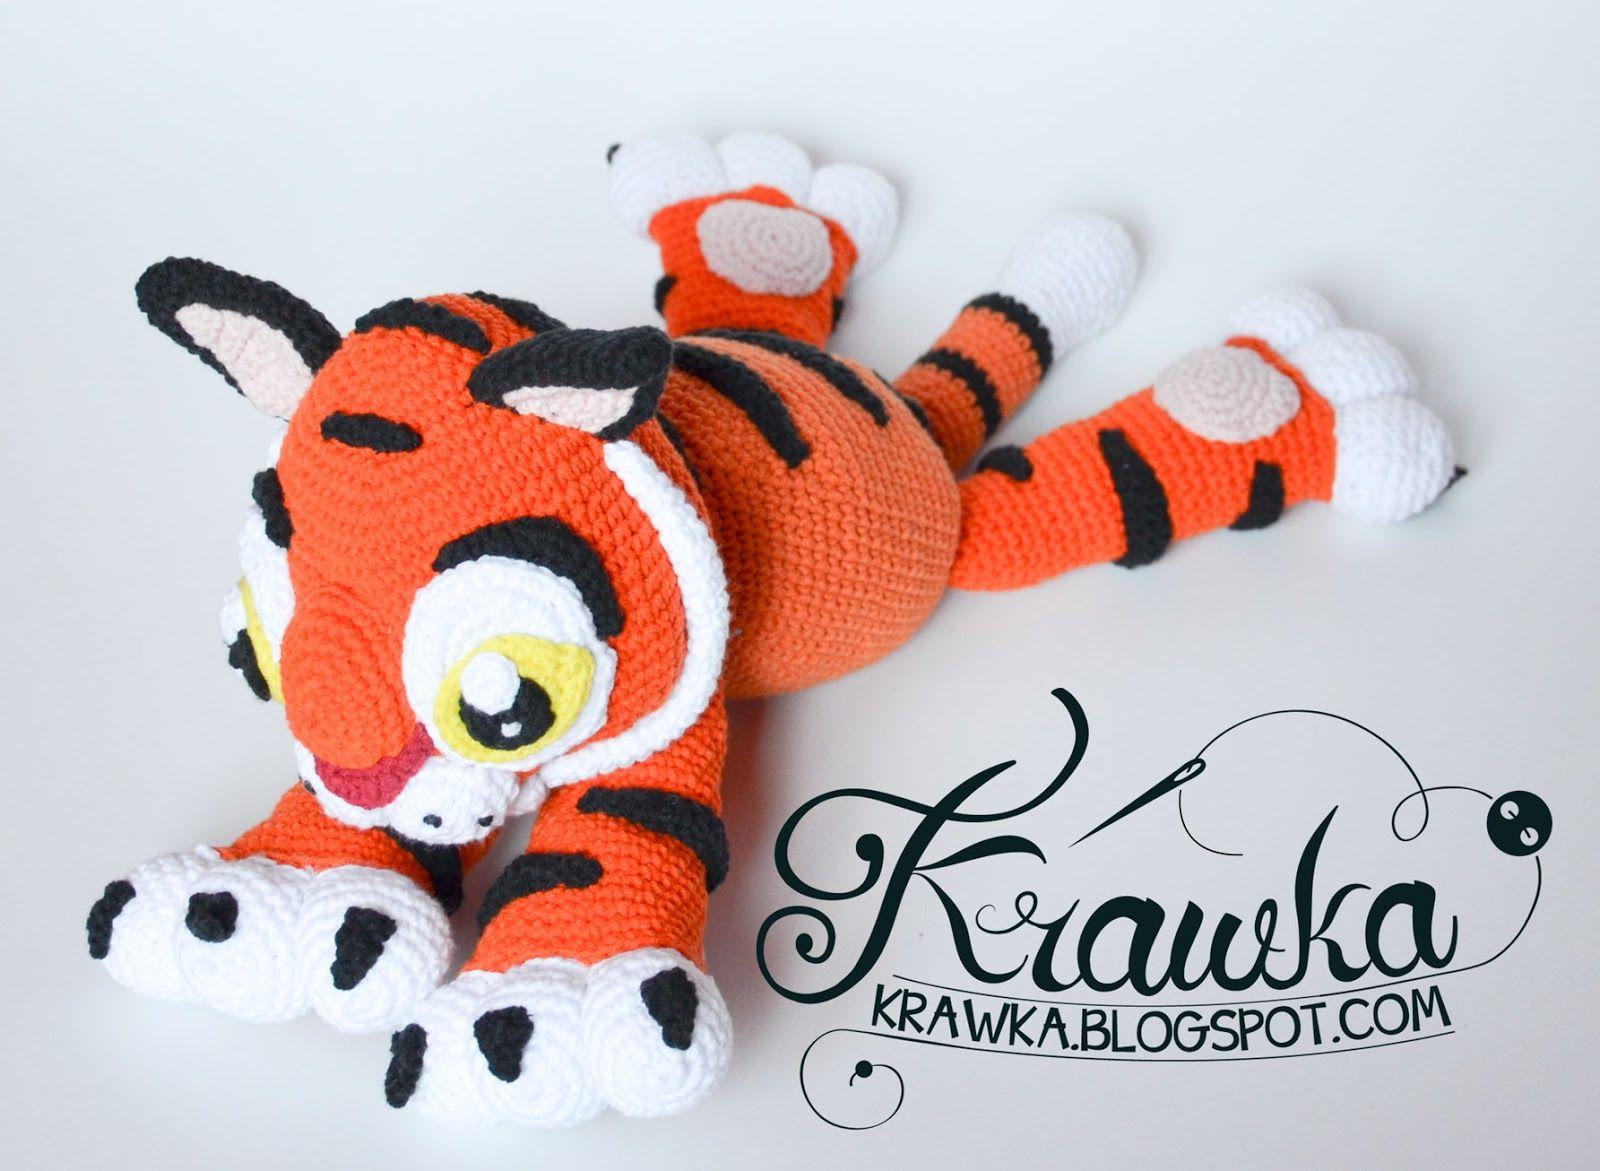 Uncategorized Tiger From Aladdin krawka baby tiger rajah crochet pattern inspired on character from disneys movie aladdin